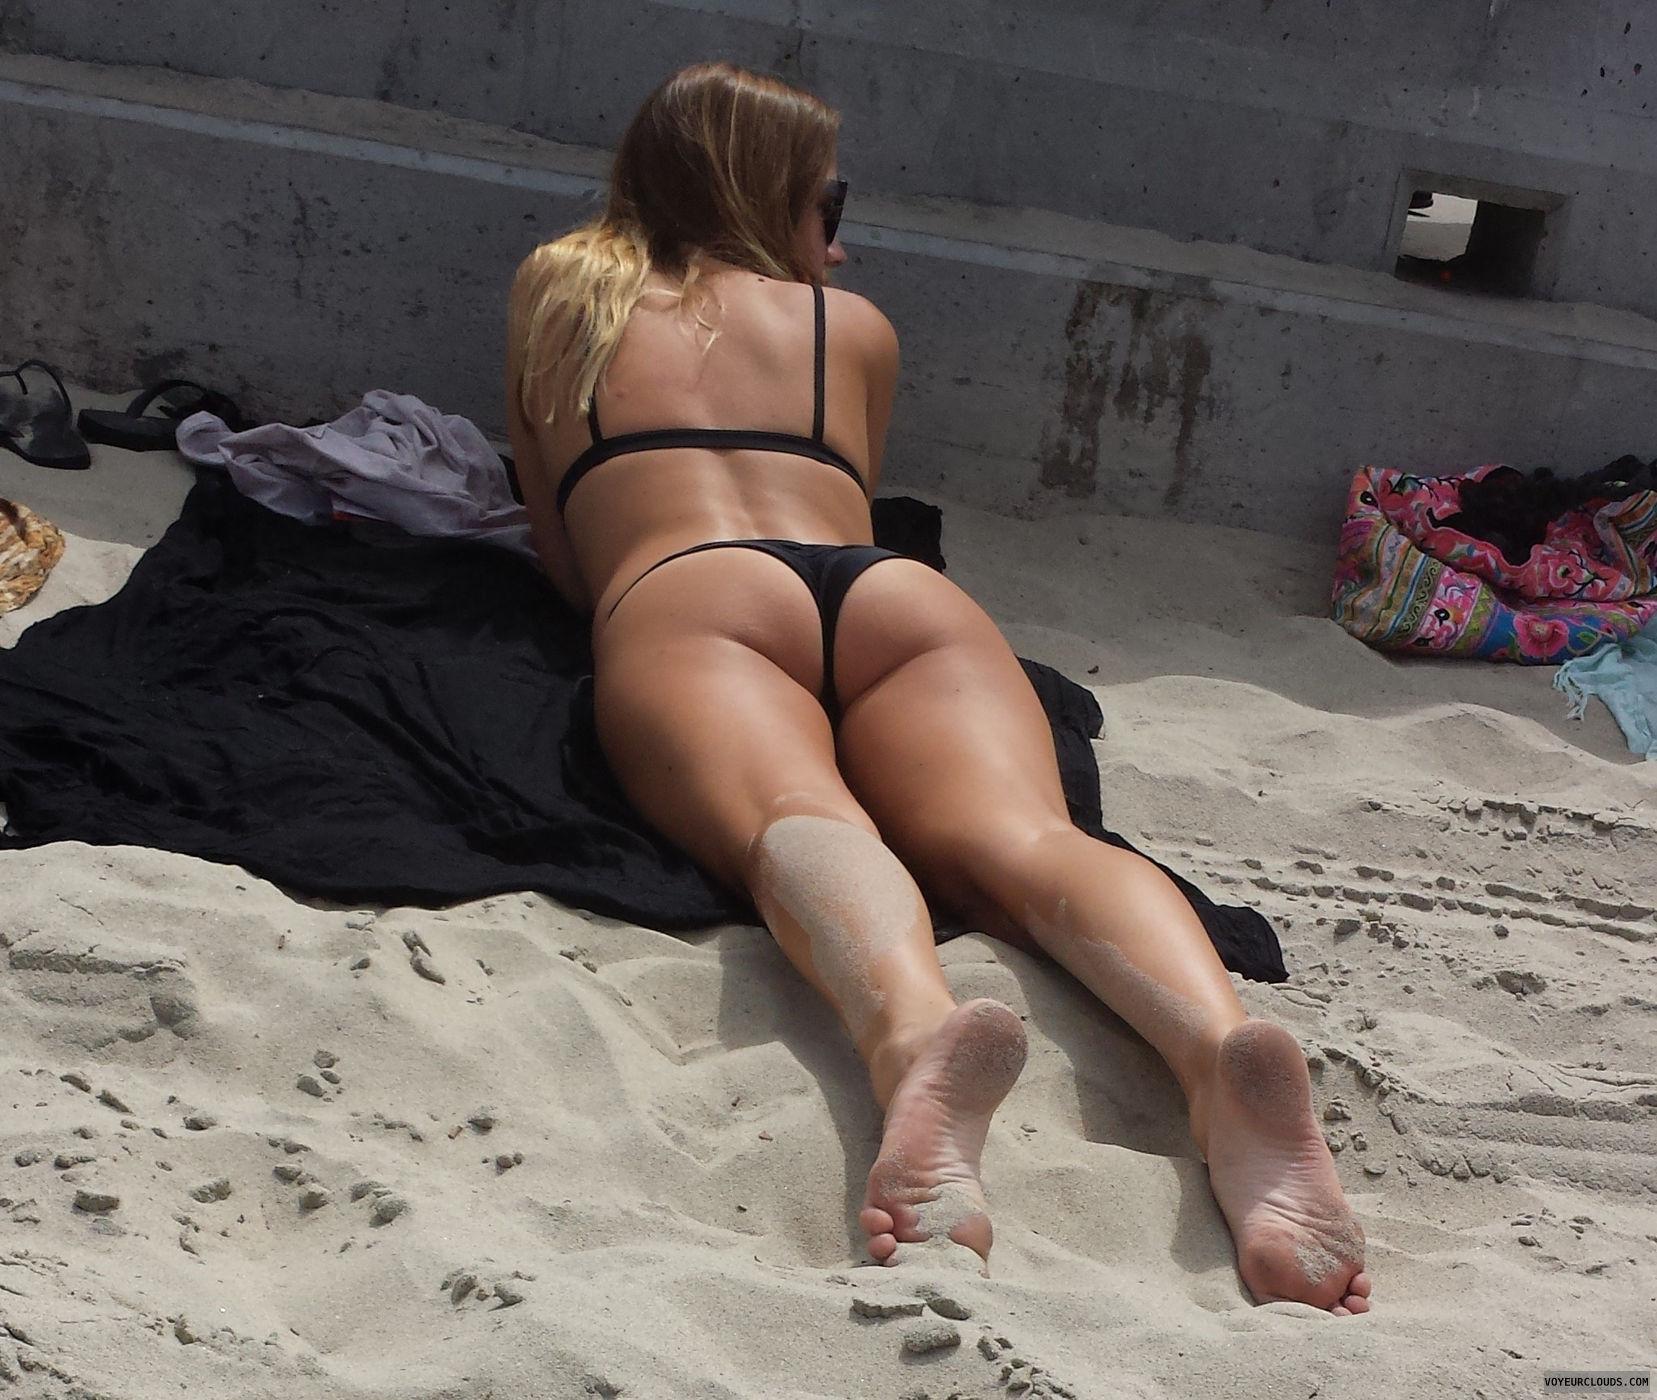 Ass booty butt shorts tushy